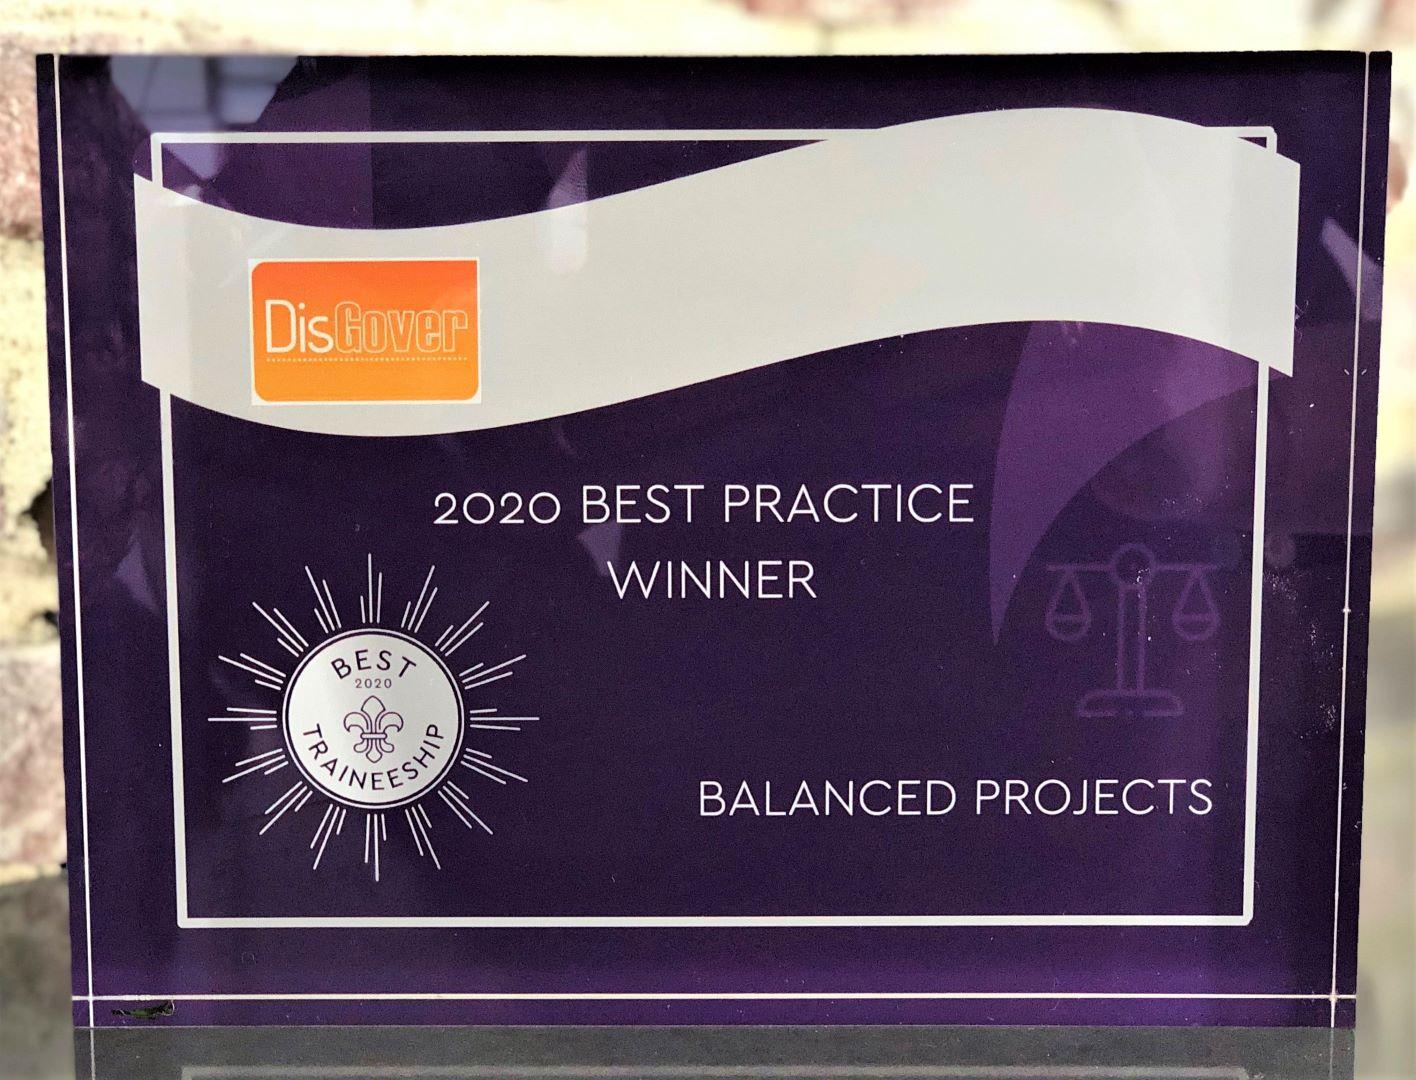 DisGover Best Practice 2020